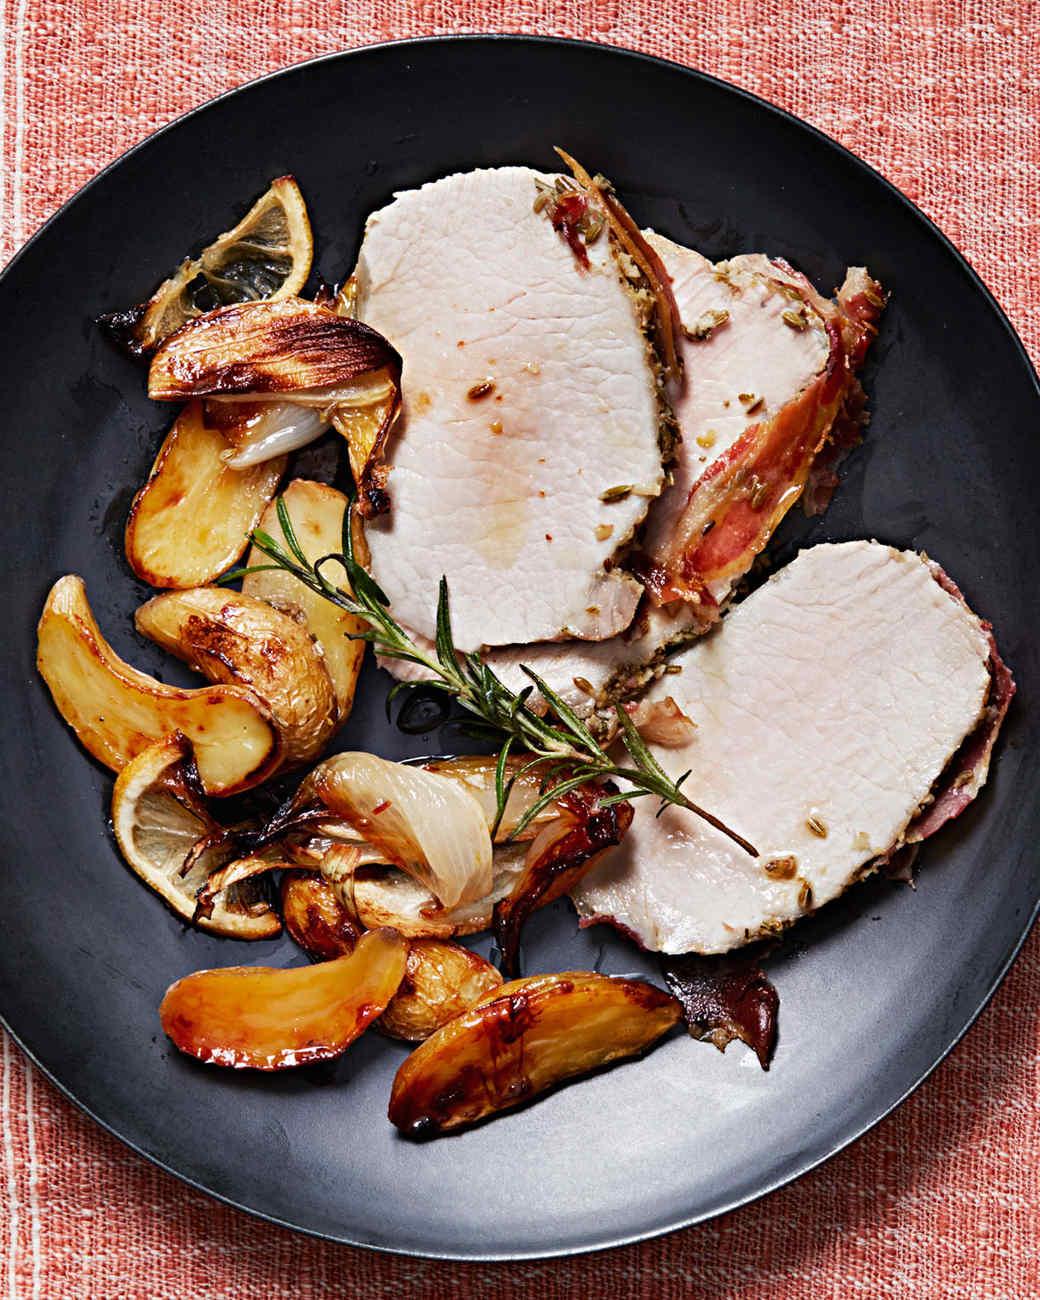 Porchetta-Style Roast Pork